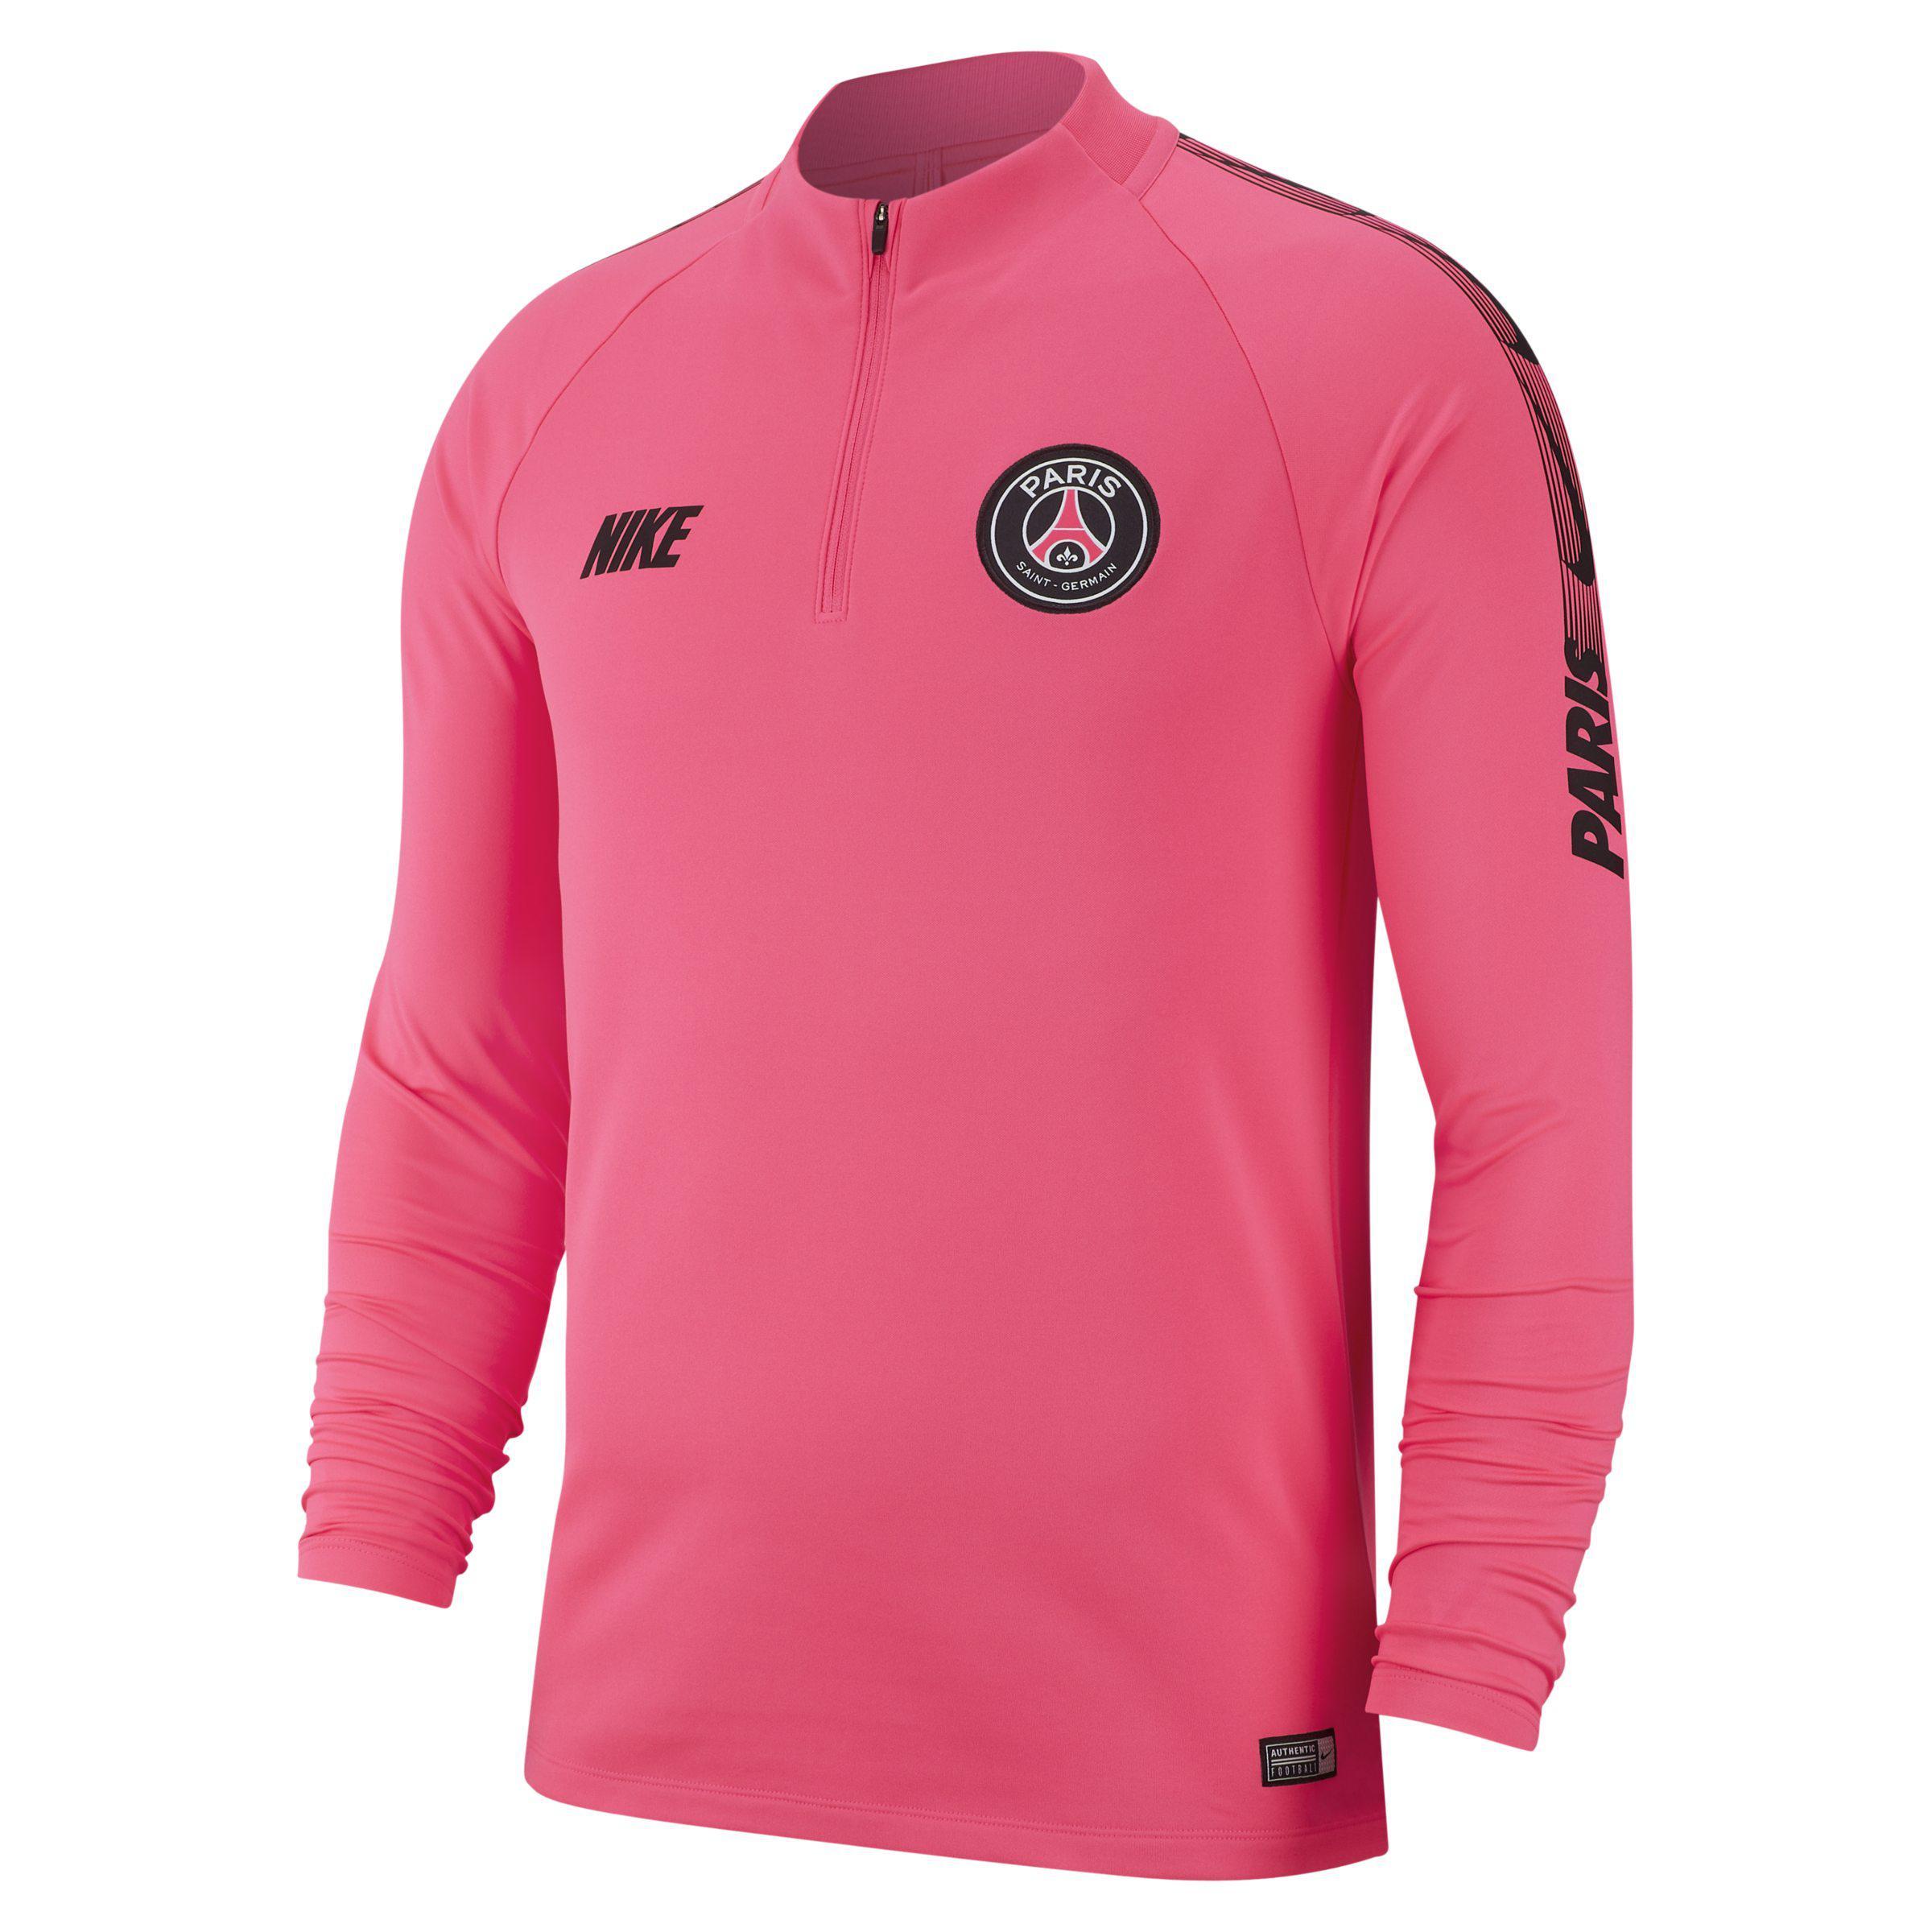 755da52116877 Nike Paris Saint-germain Dri-fit Squad Drill Long-sleeve Football ...